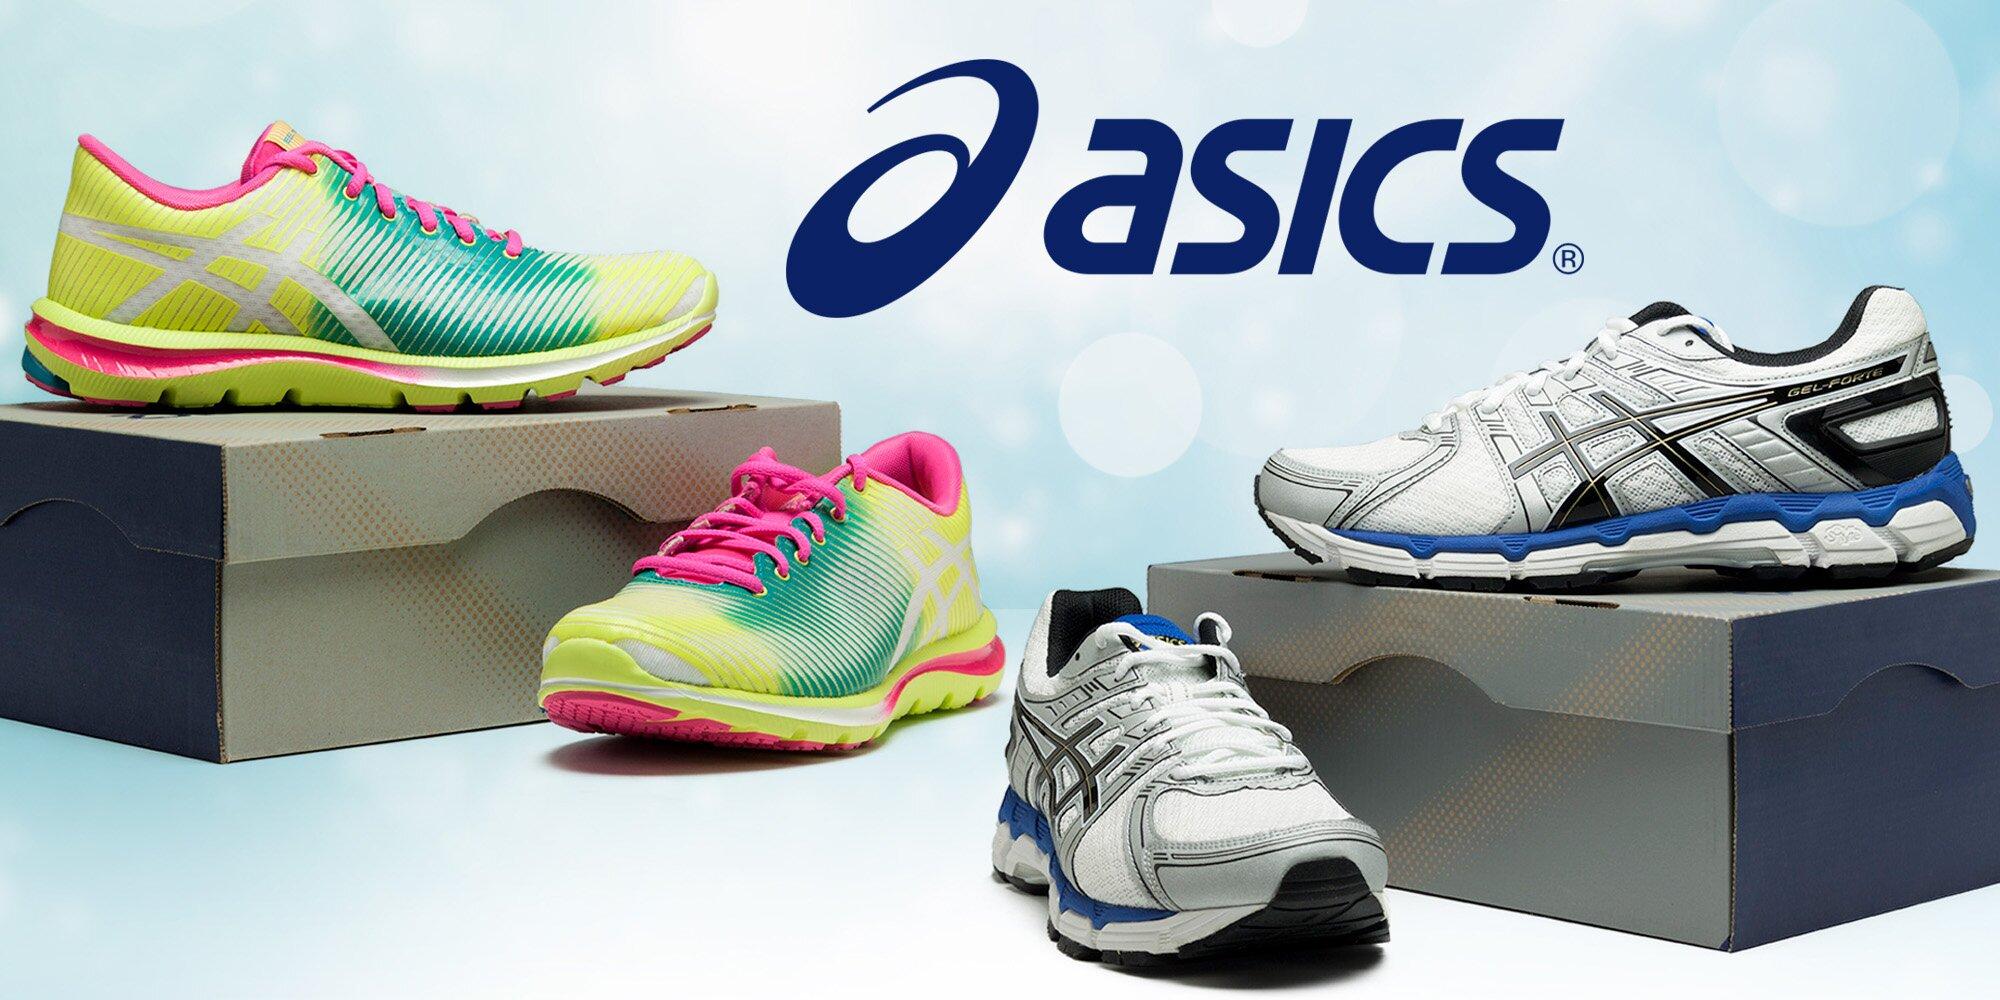 Pohodlná pánska a dámska bežecká obuv Asics  aab45c241c5